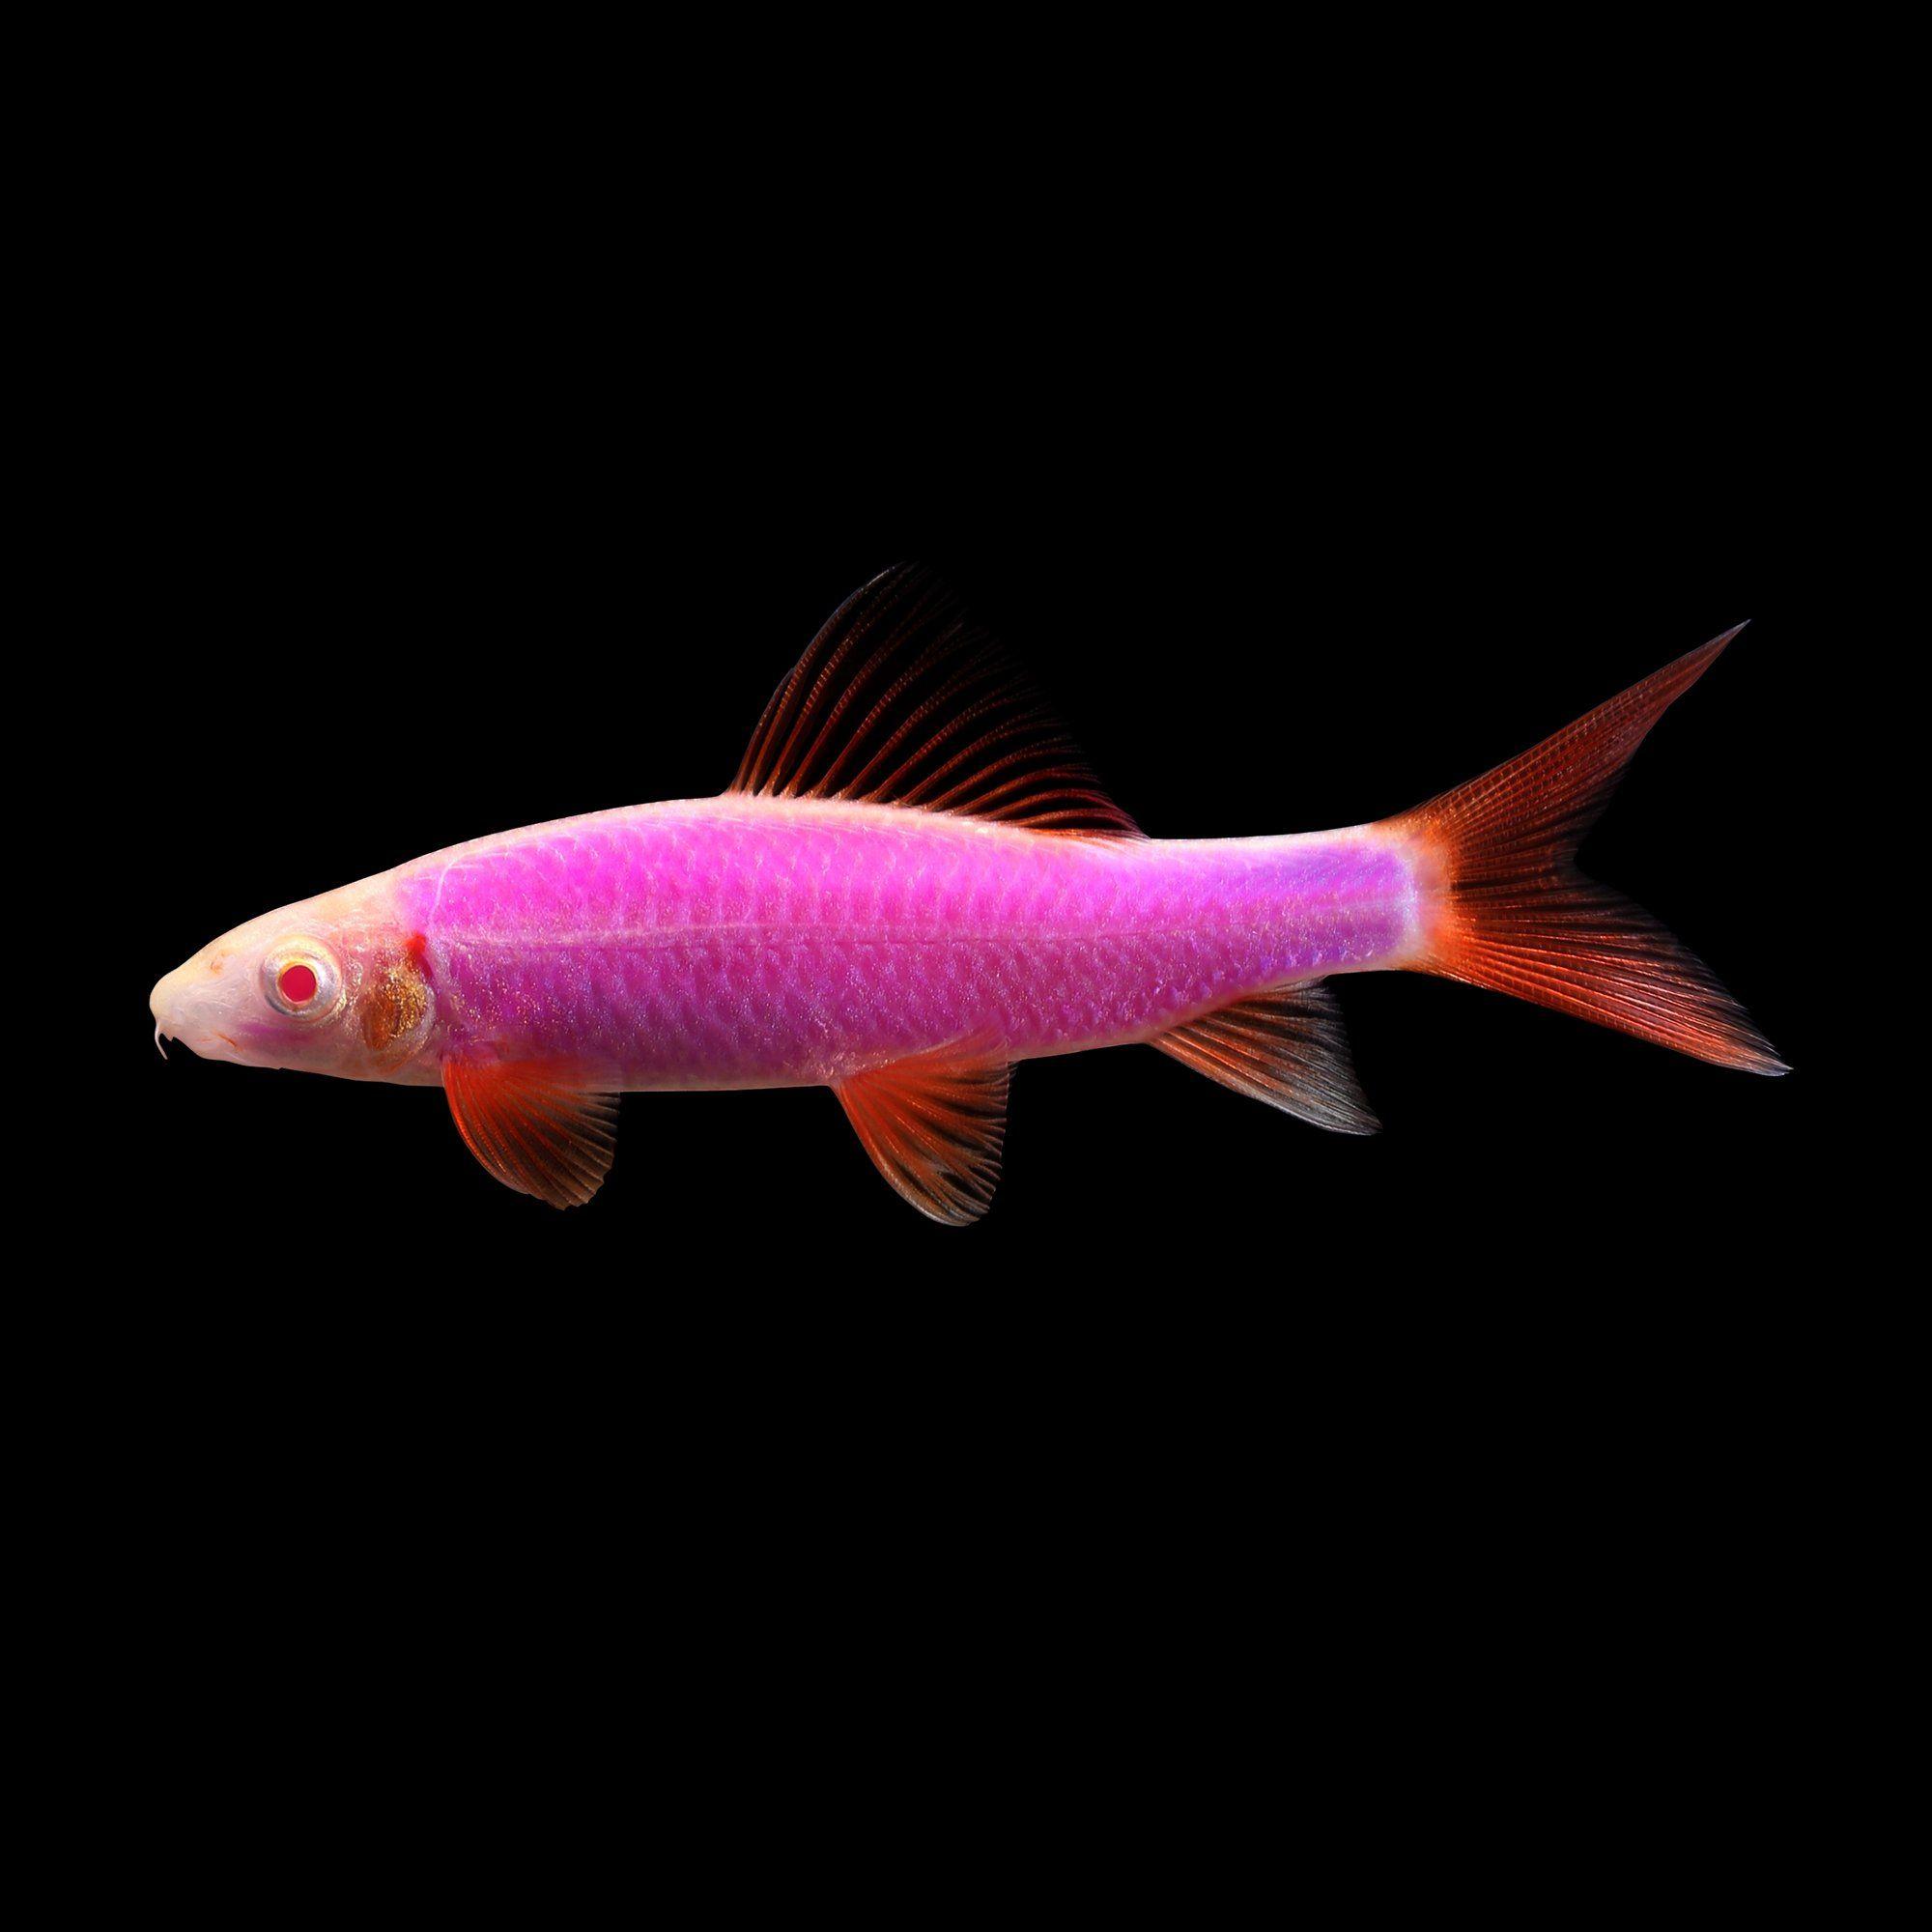 Glofish Galactic Purple Sharks For Sale Order Online Petco In 2020 Glofish Petco Glow Fish